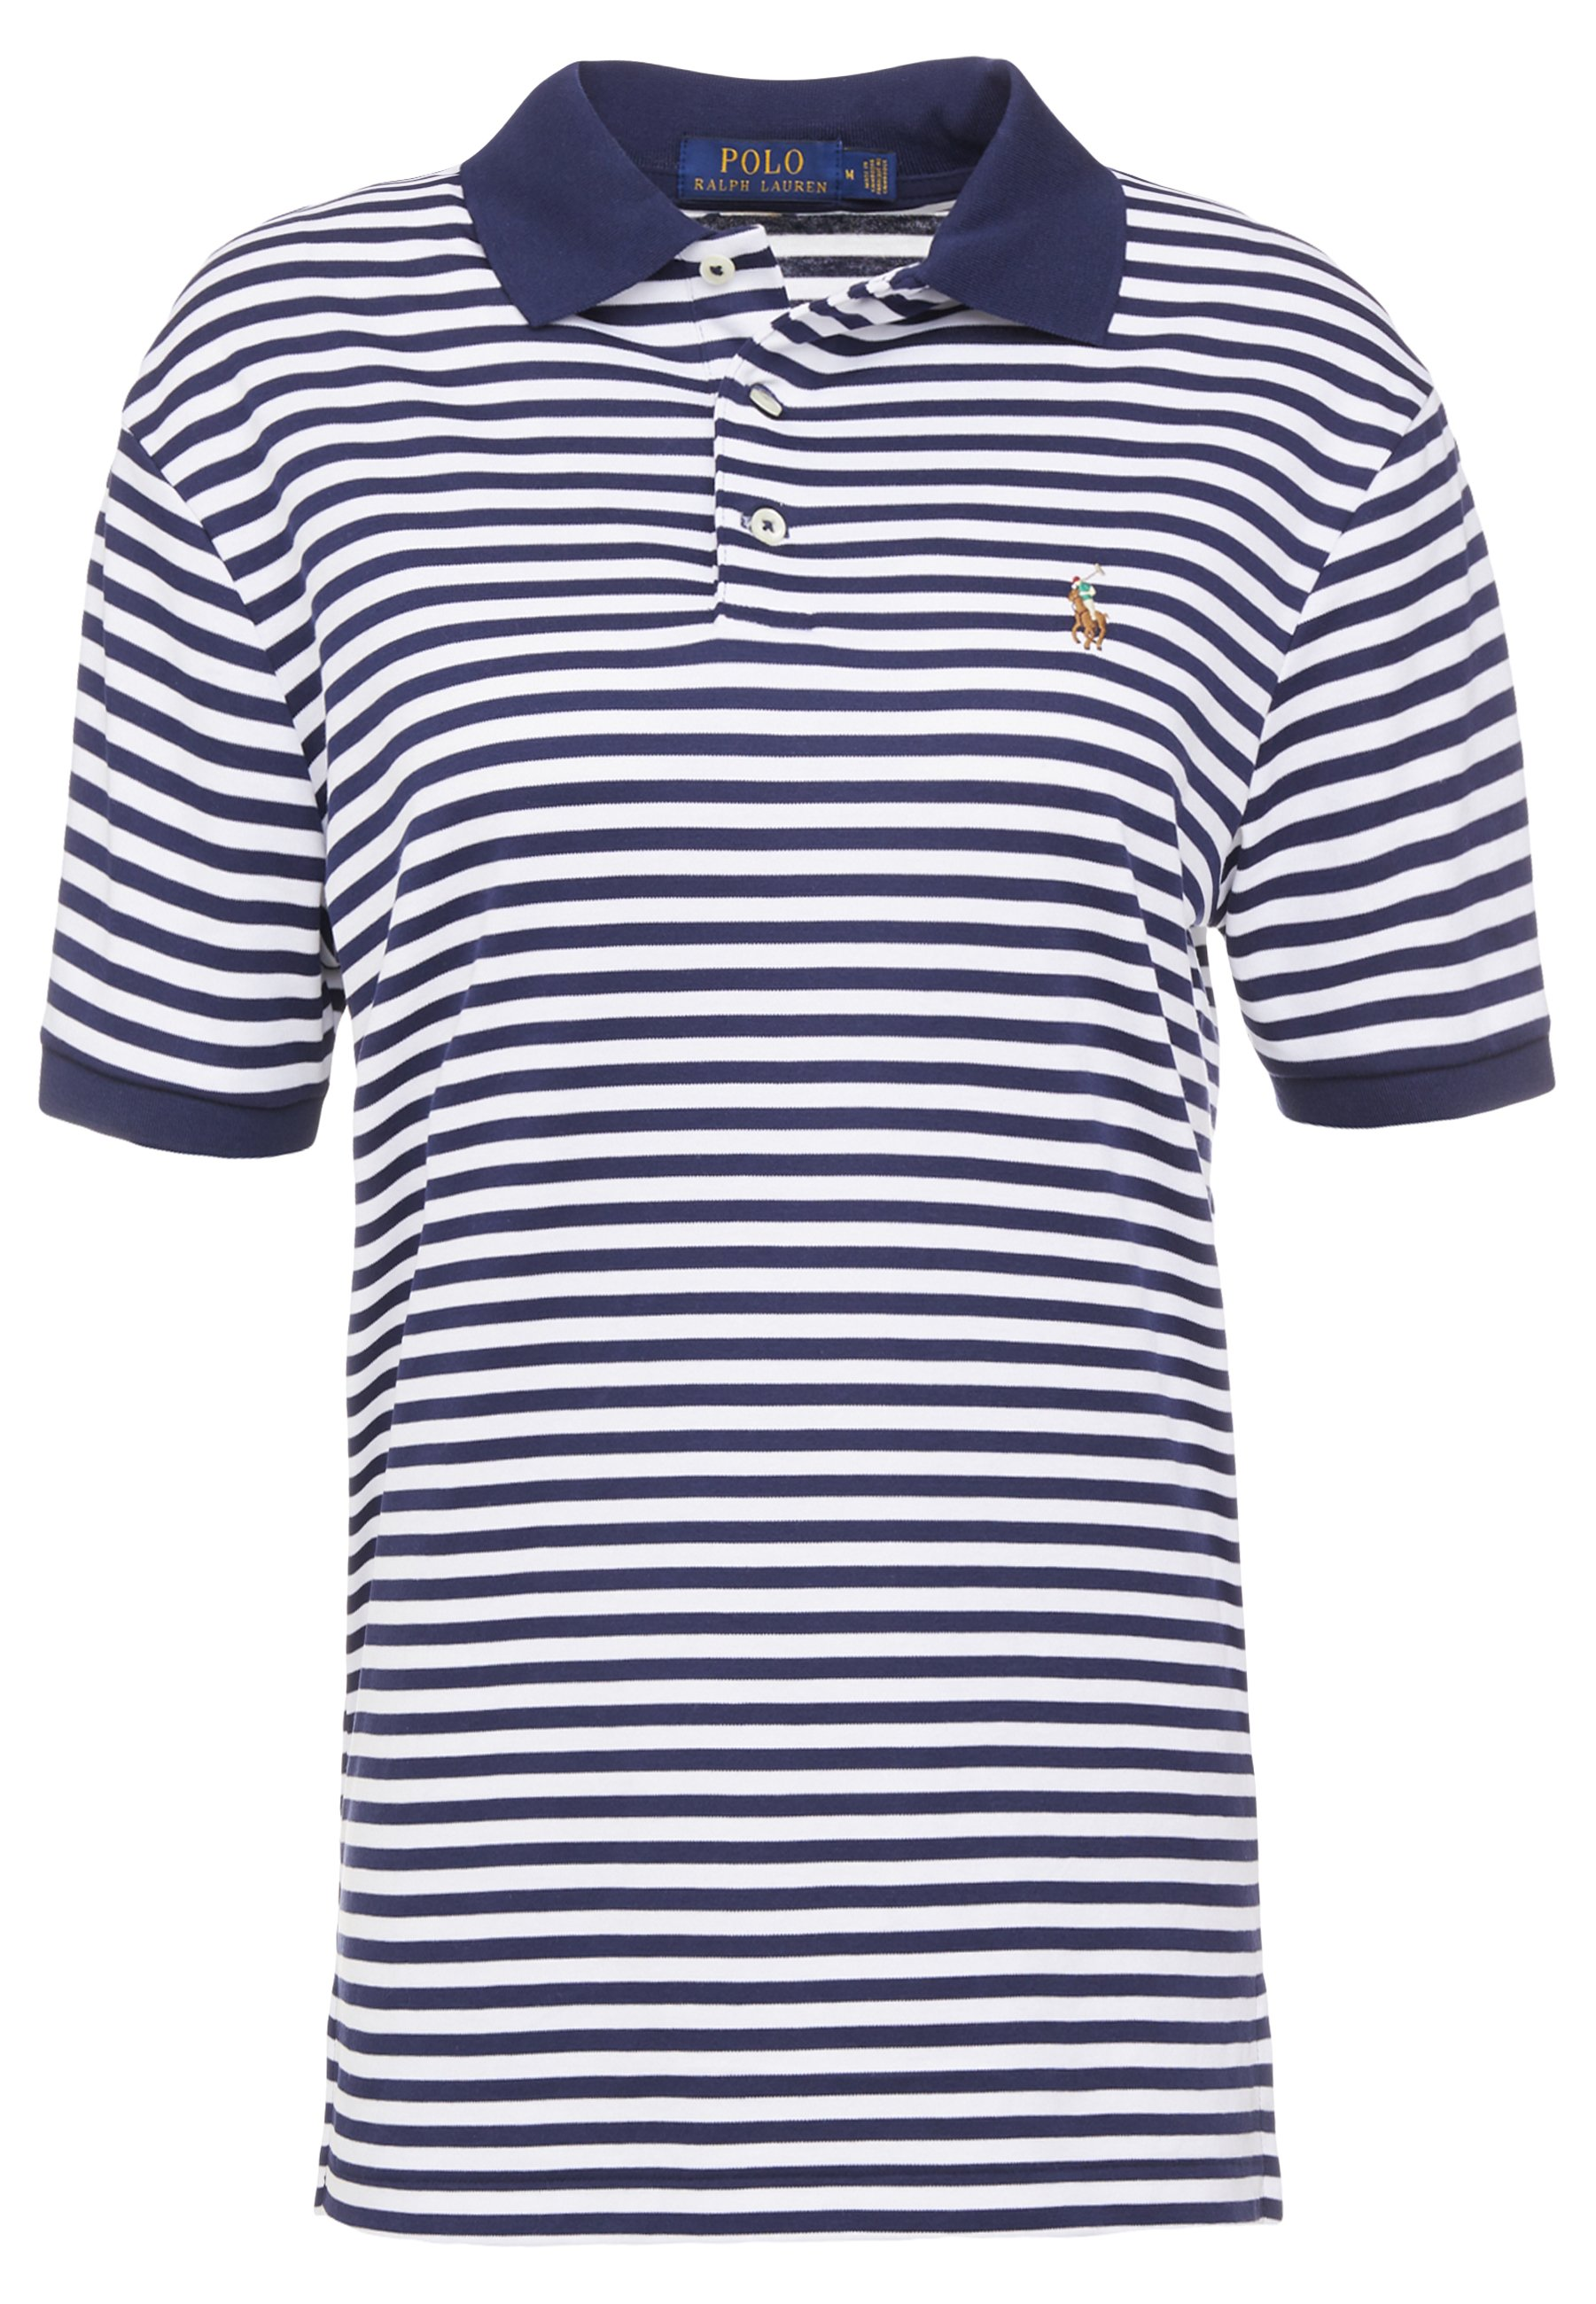 Polo Ralph Lauren Pima - Piké French Navy/multi-coloured